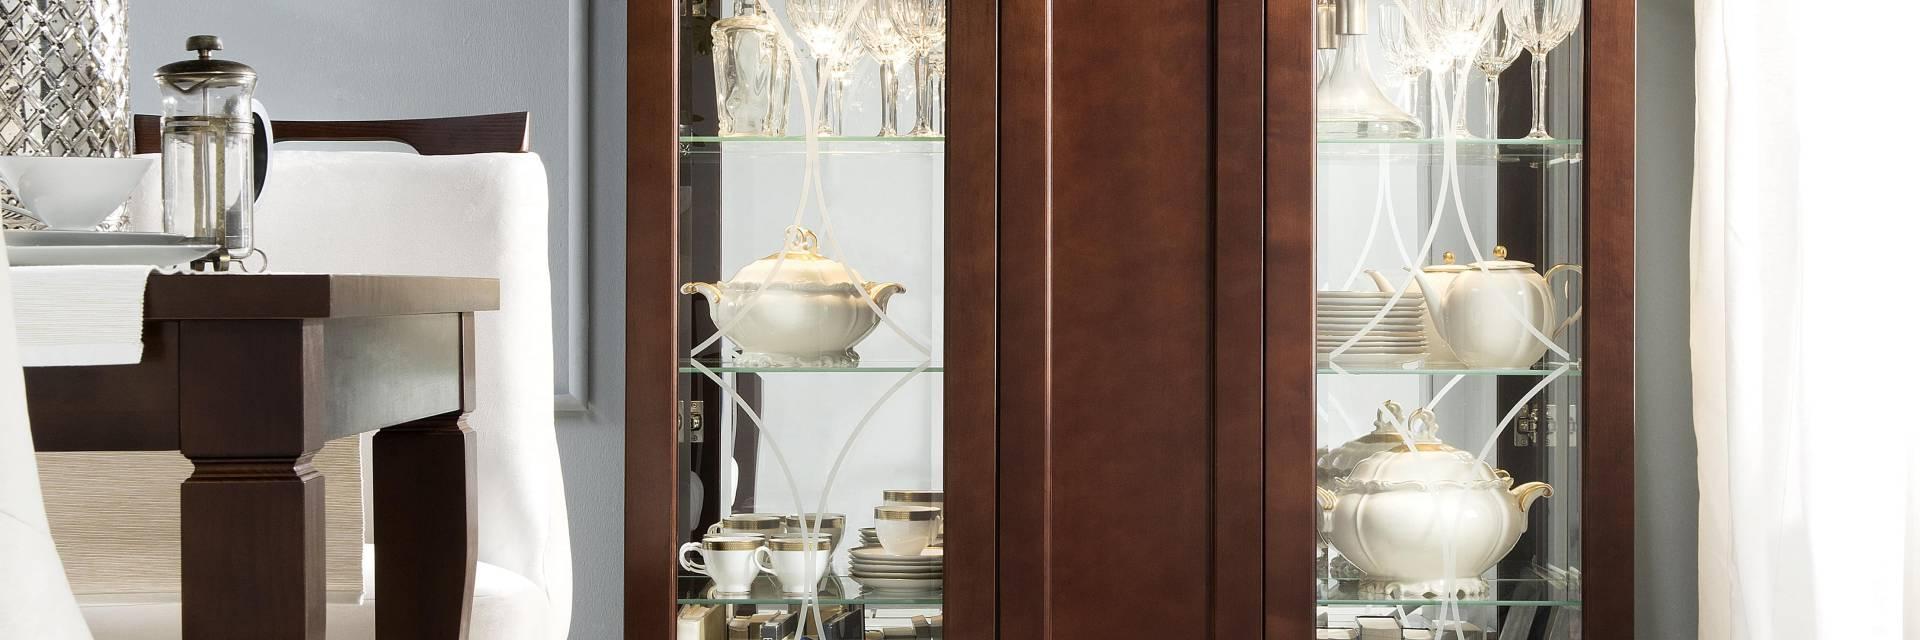 kolekcja Granada szynaka meble - barek